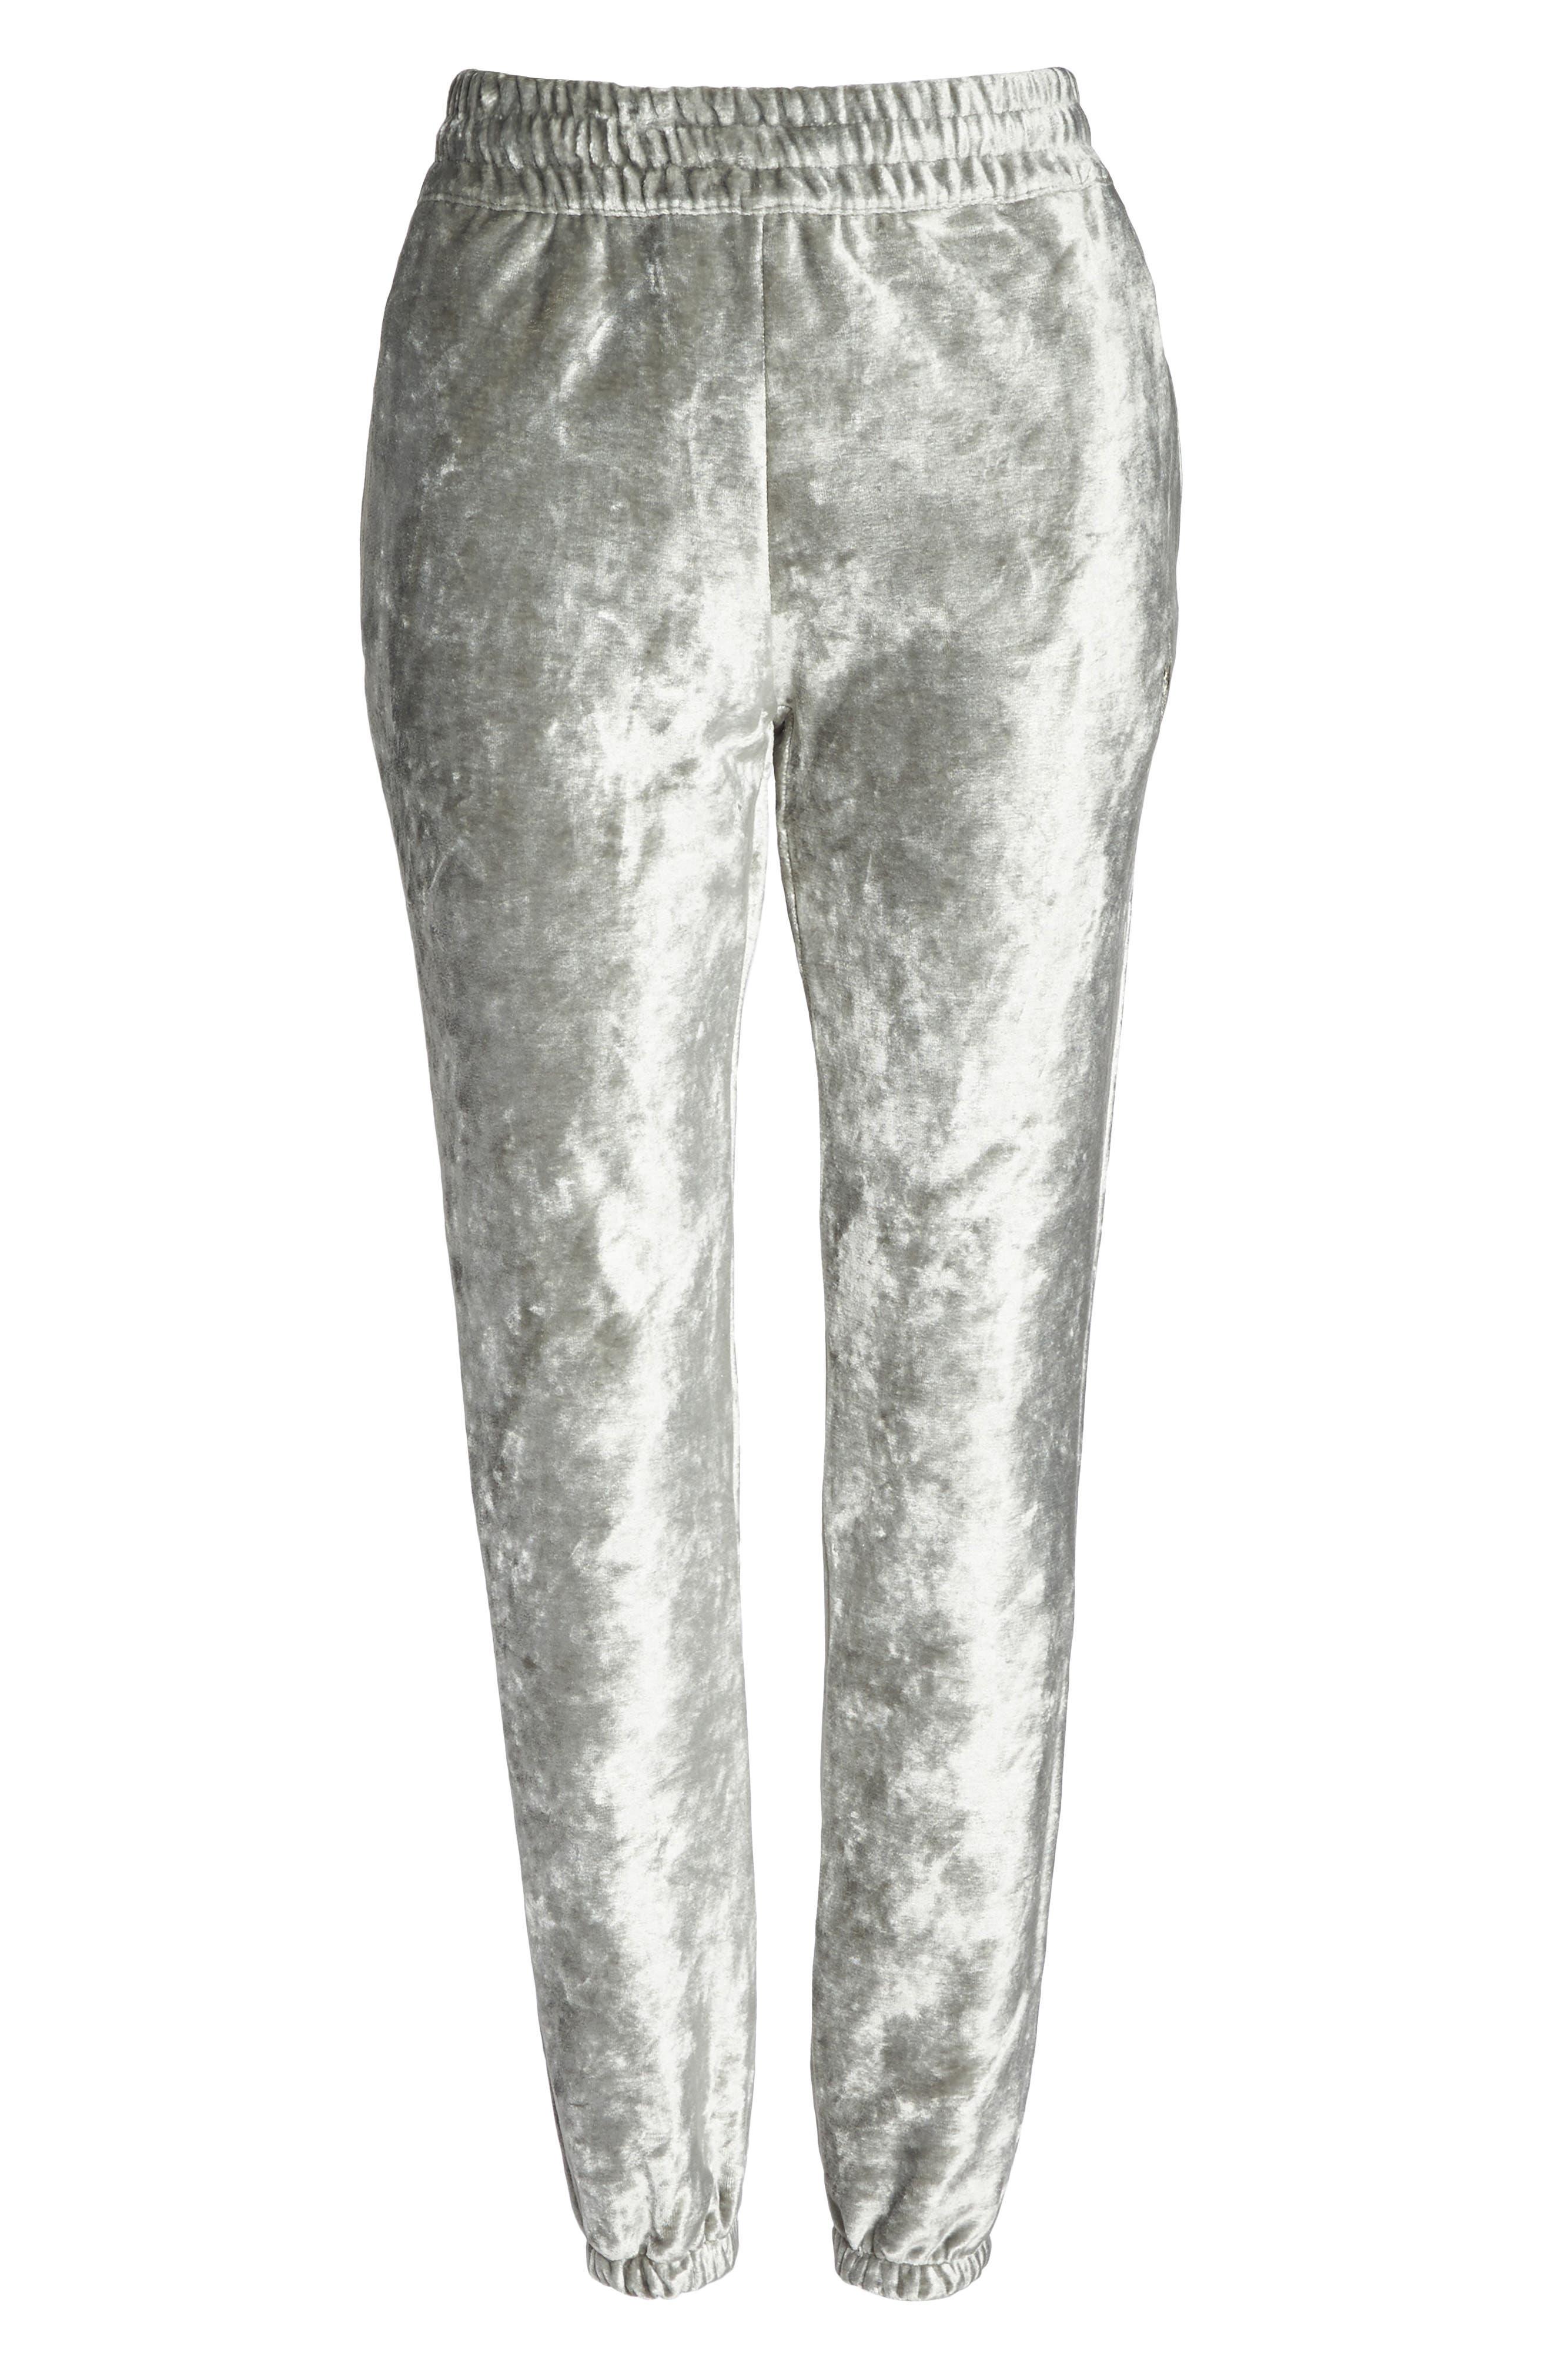 NIKE,                             NikeLab Essentials Women's Velour Pants,                             Alternate thumbnail 7, color,                             020